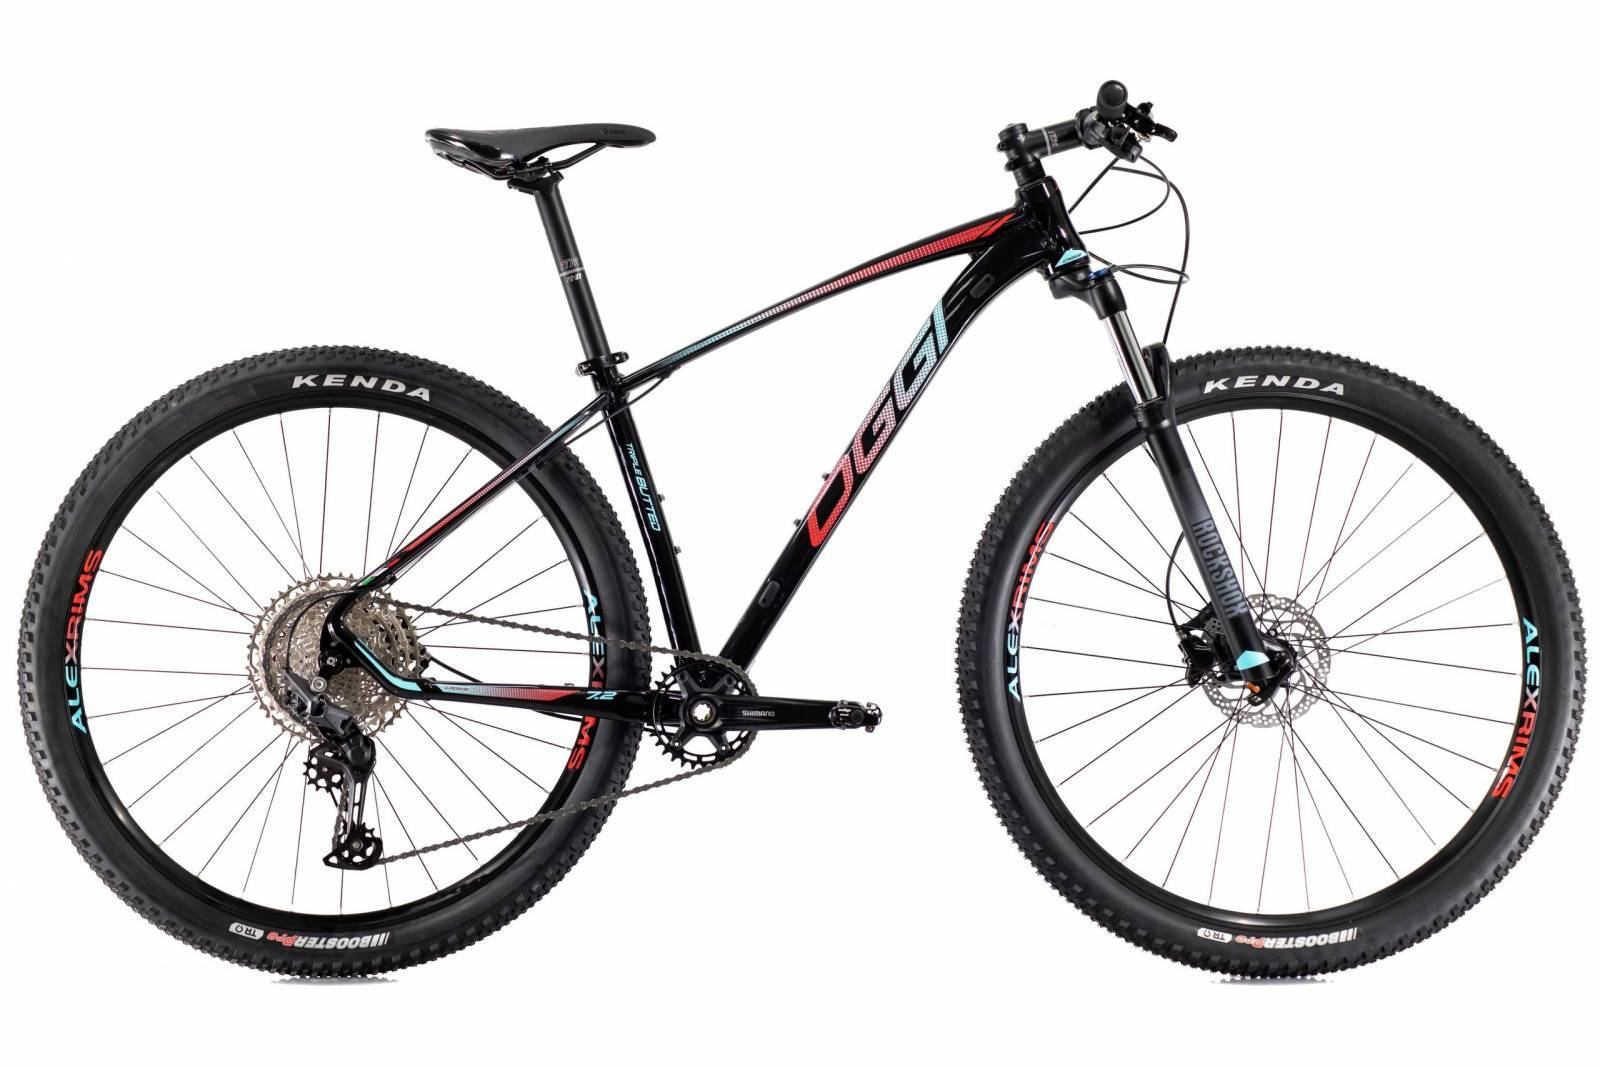 BICICLETA OGGI 7.2 SHIMANO DEORE 2021 - Cicles Jahn